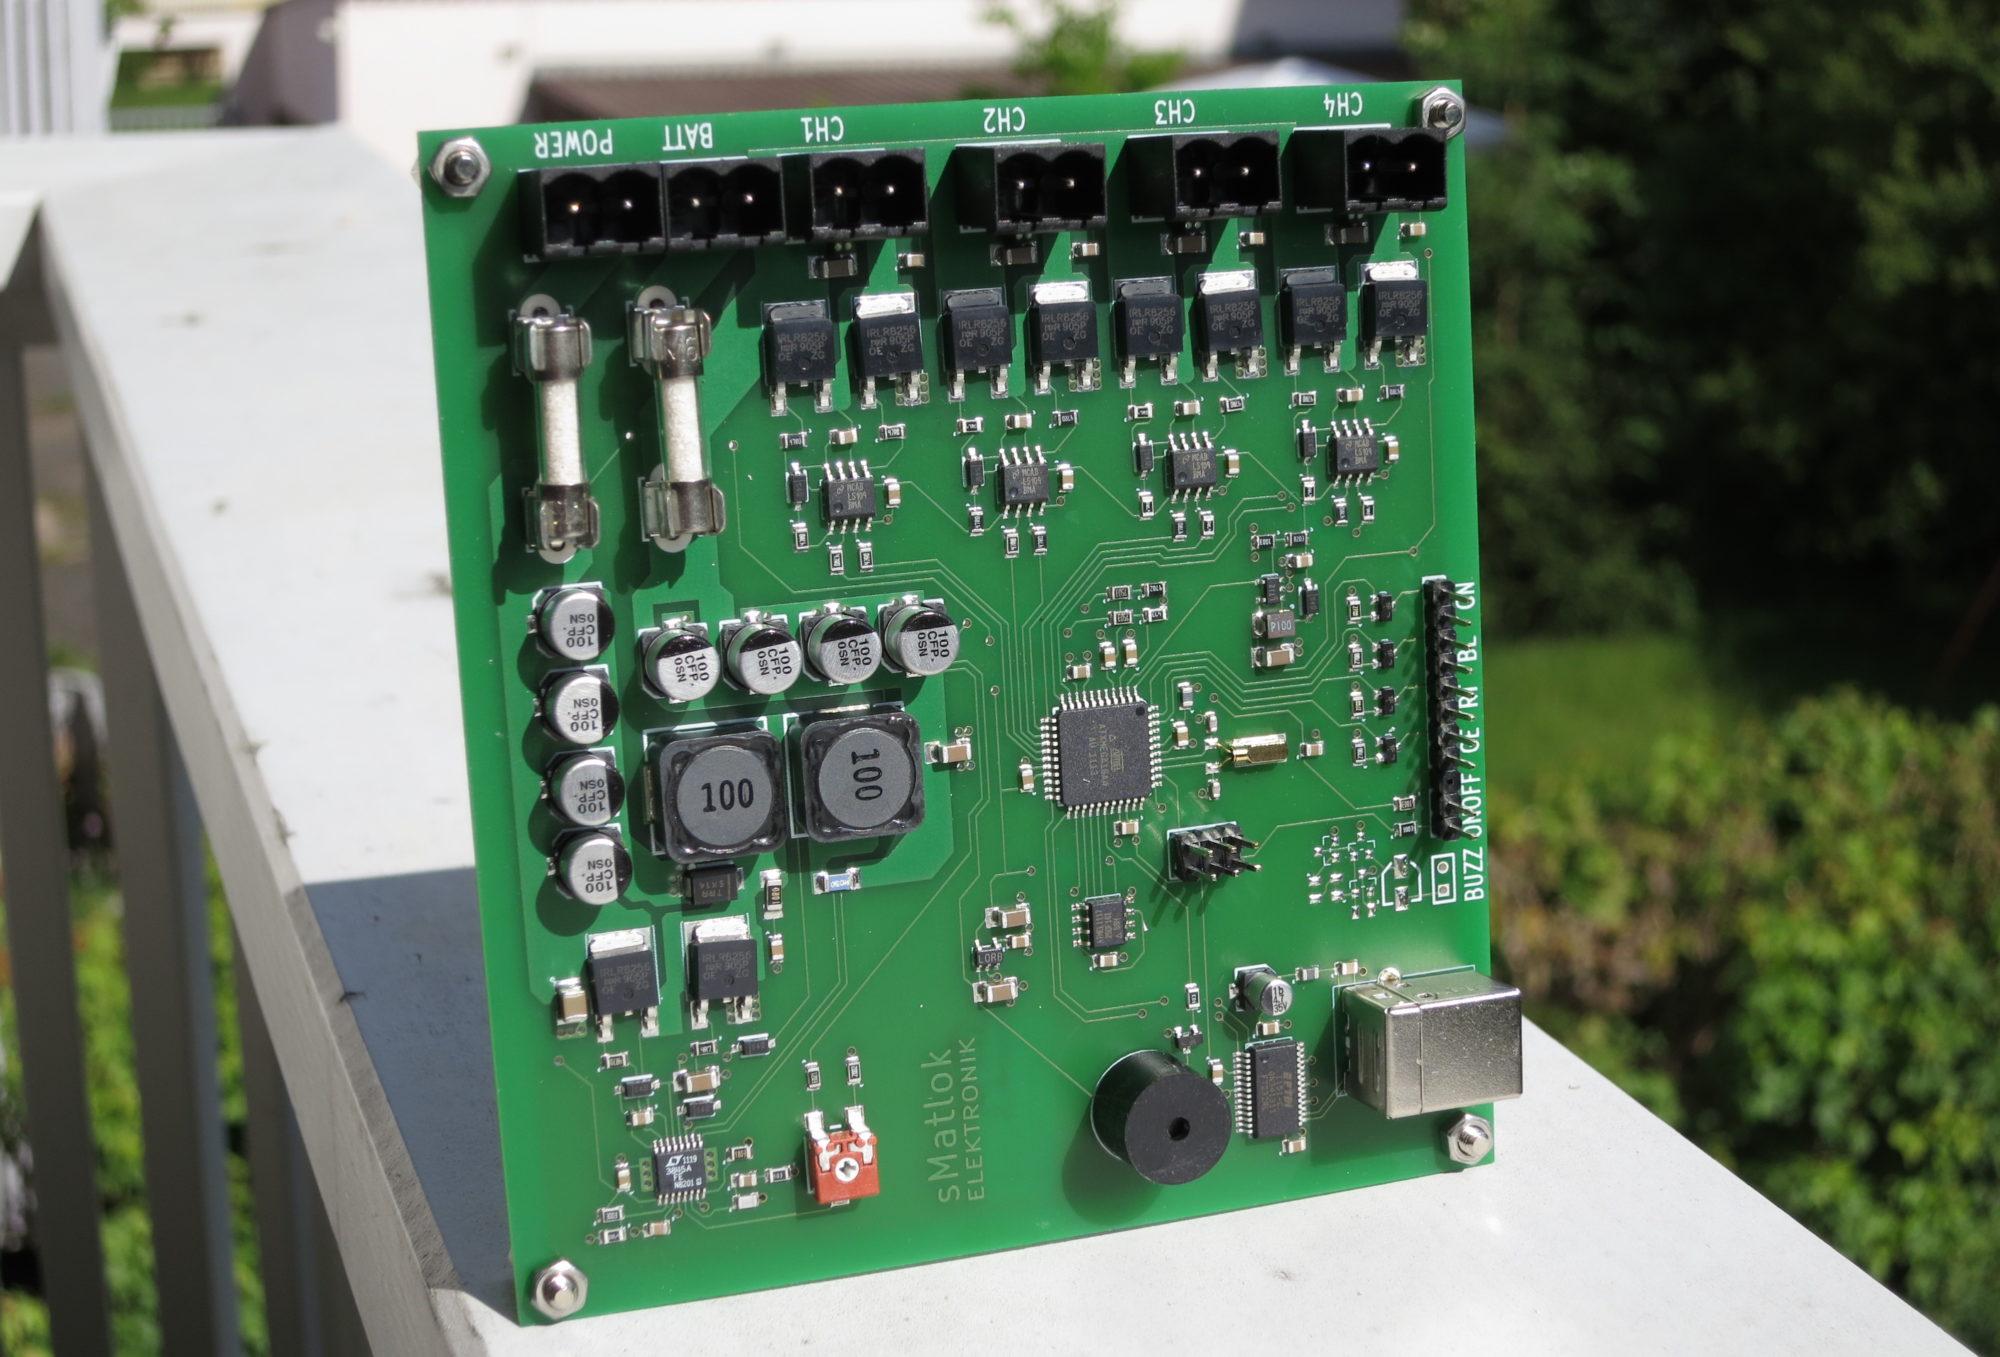 Hobbyelektroniker